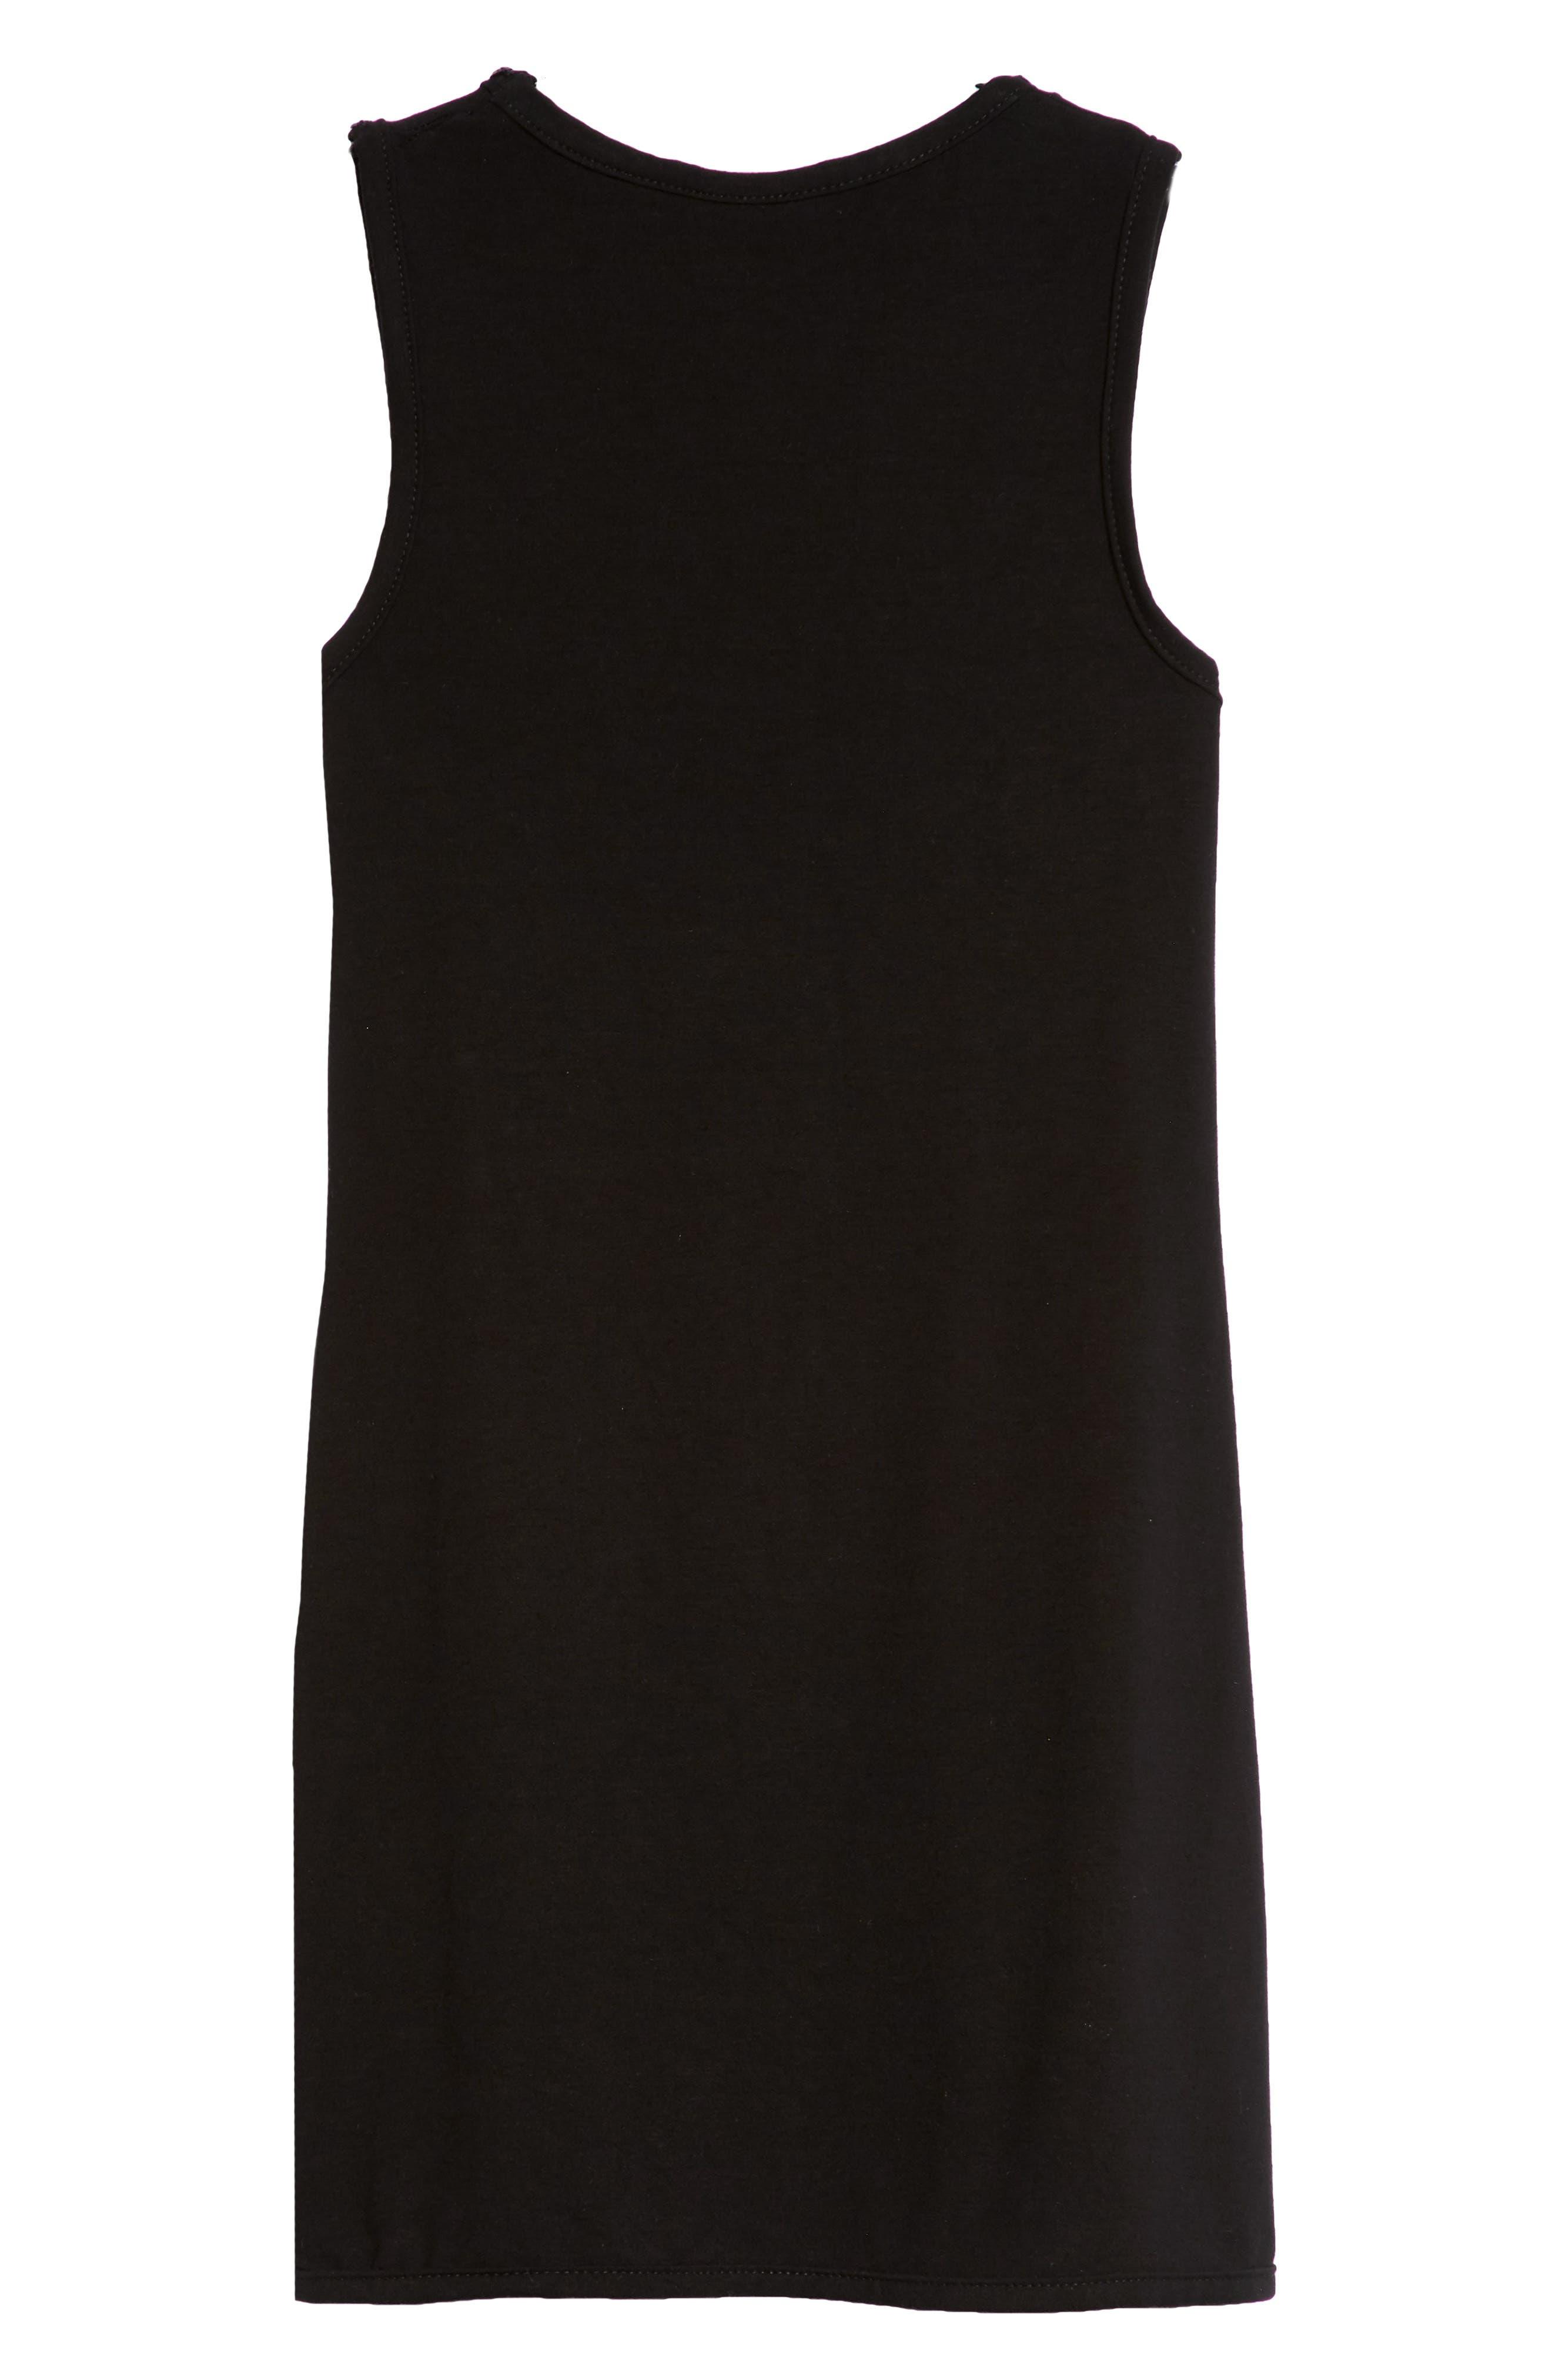 Crystal Studded Tank Dress,                             Alternate thumbnail 2, color,                             Black